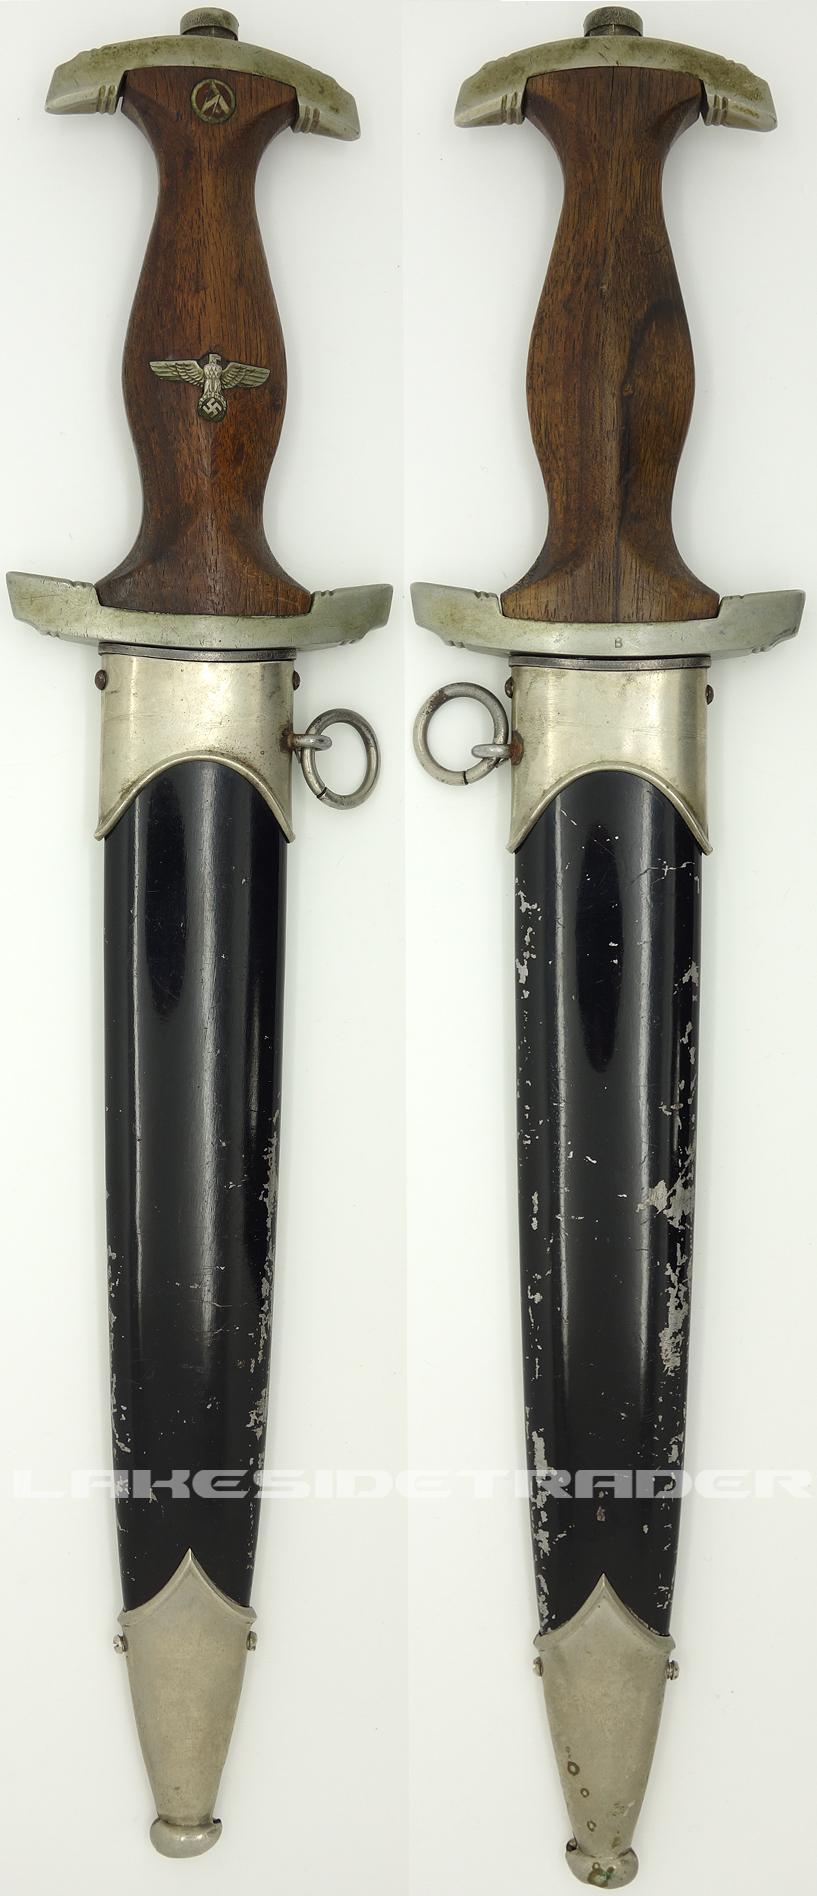 NSKK Dagger by Haco